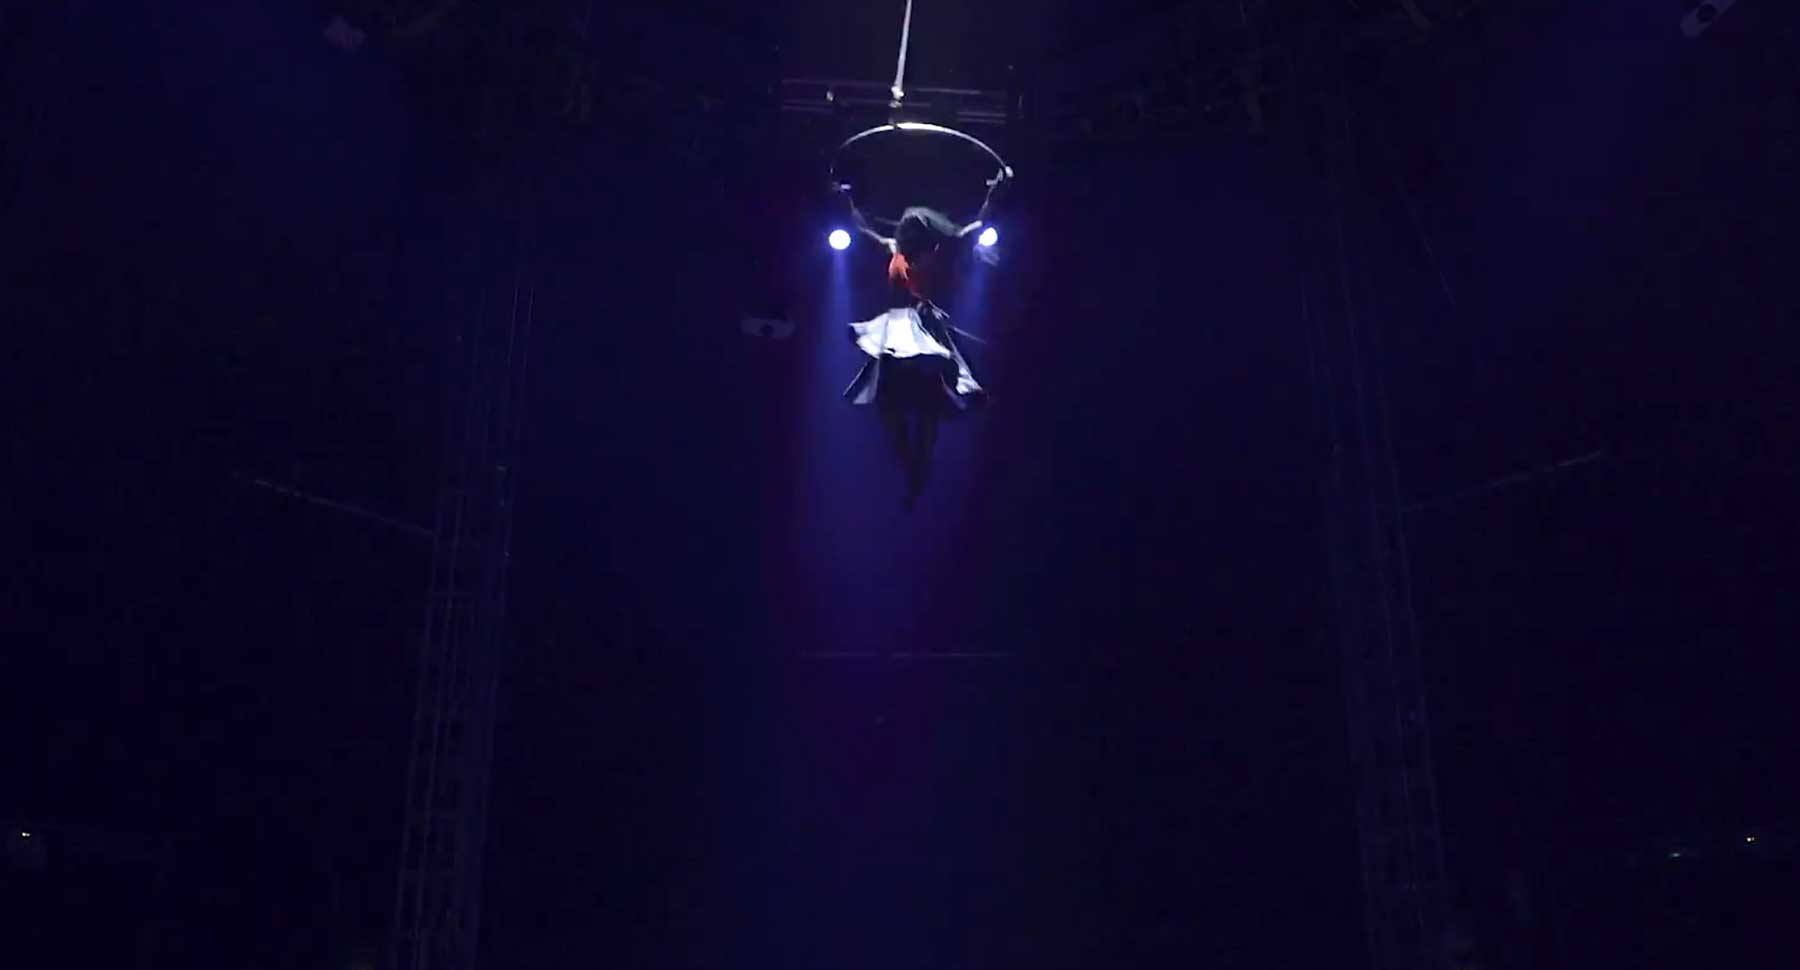 Luftakrobatin Blaze Tarsha im Videoportrait